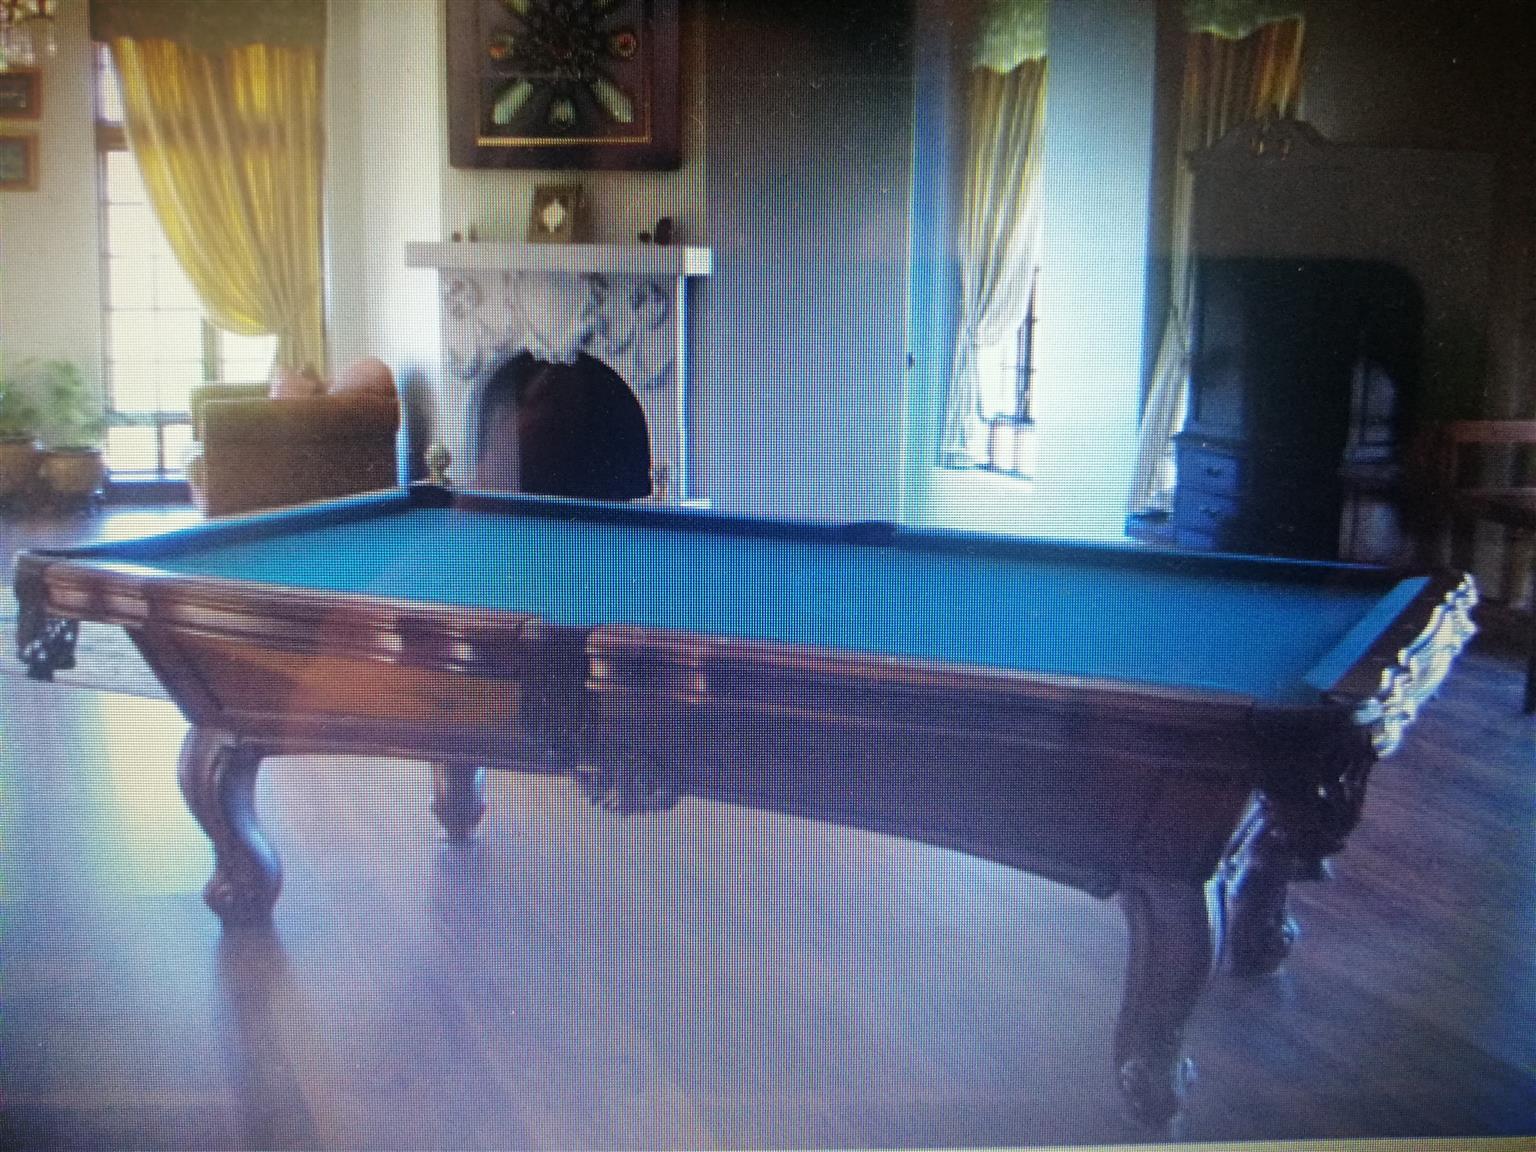 Solid carved wood, slate pool table